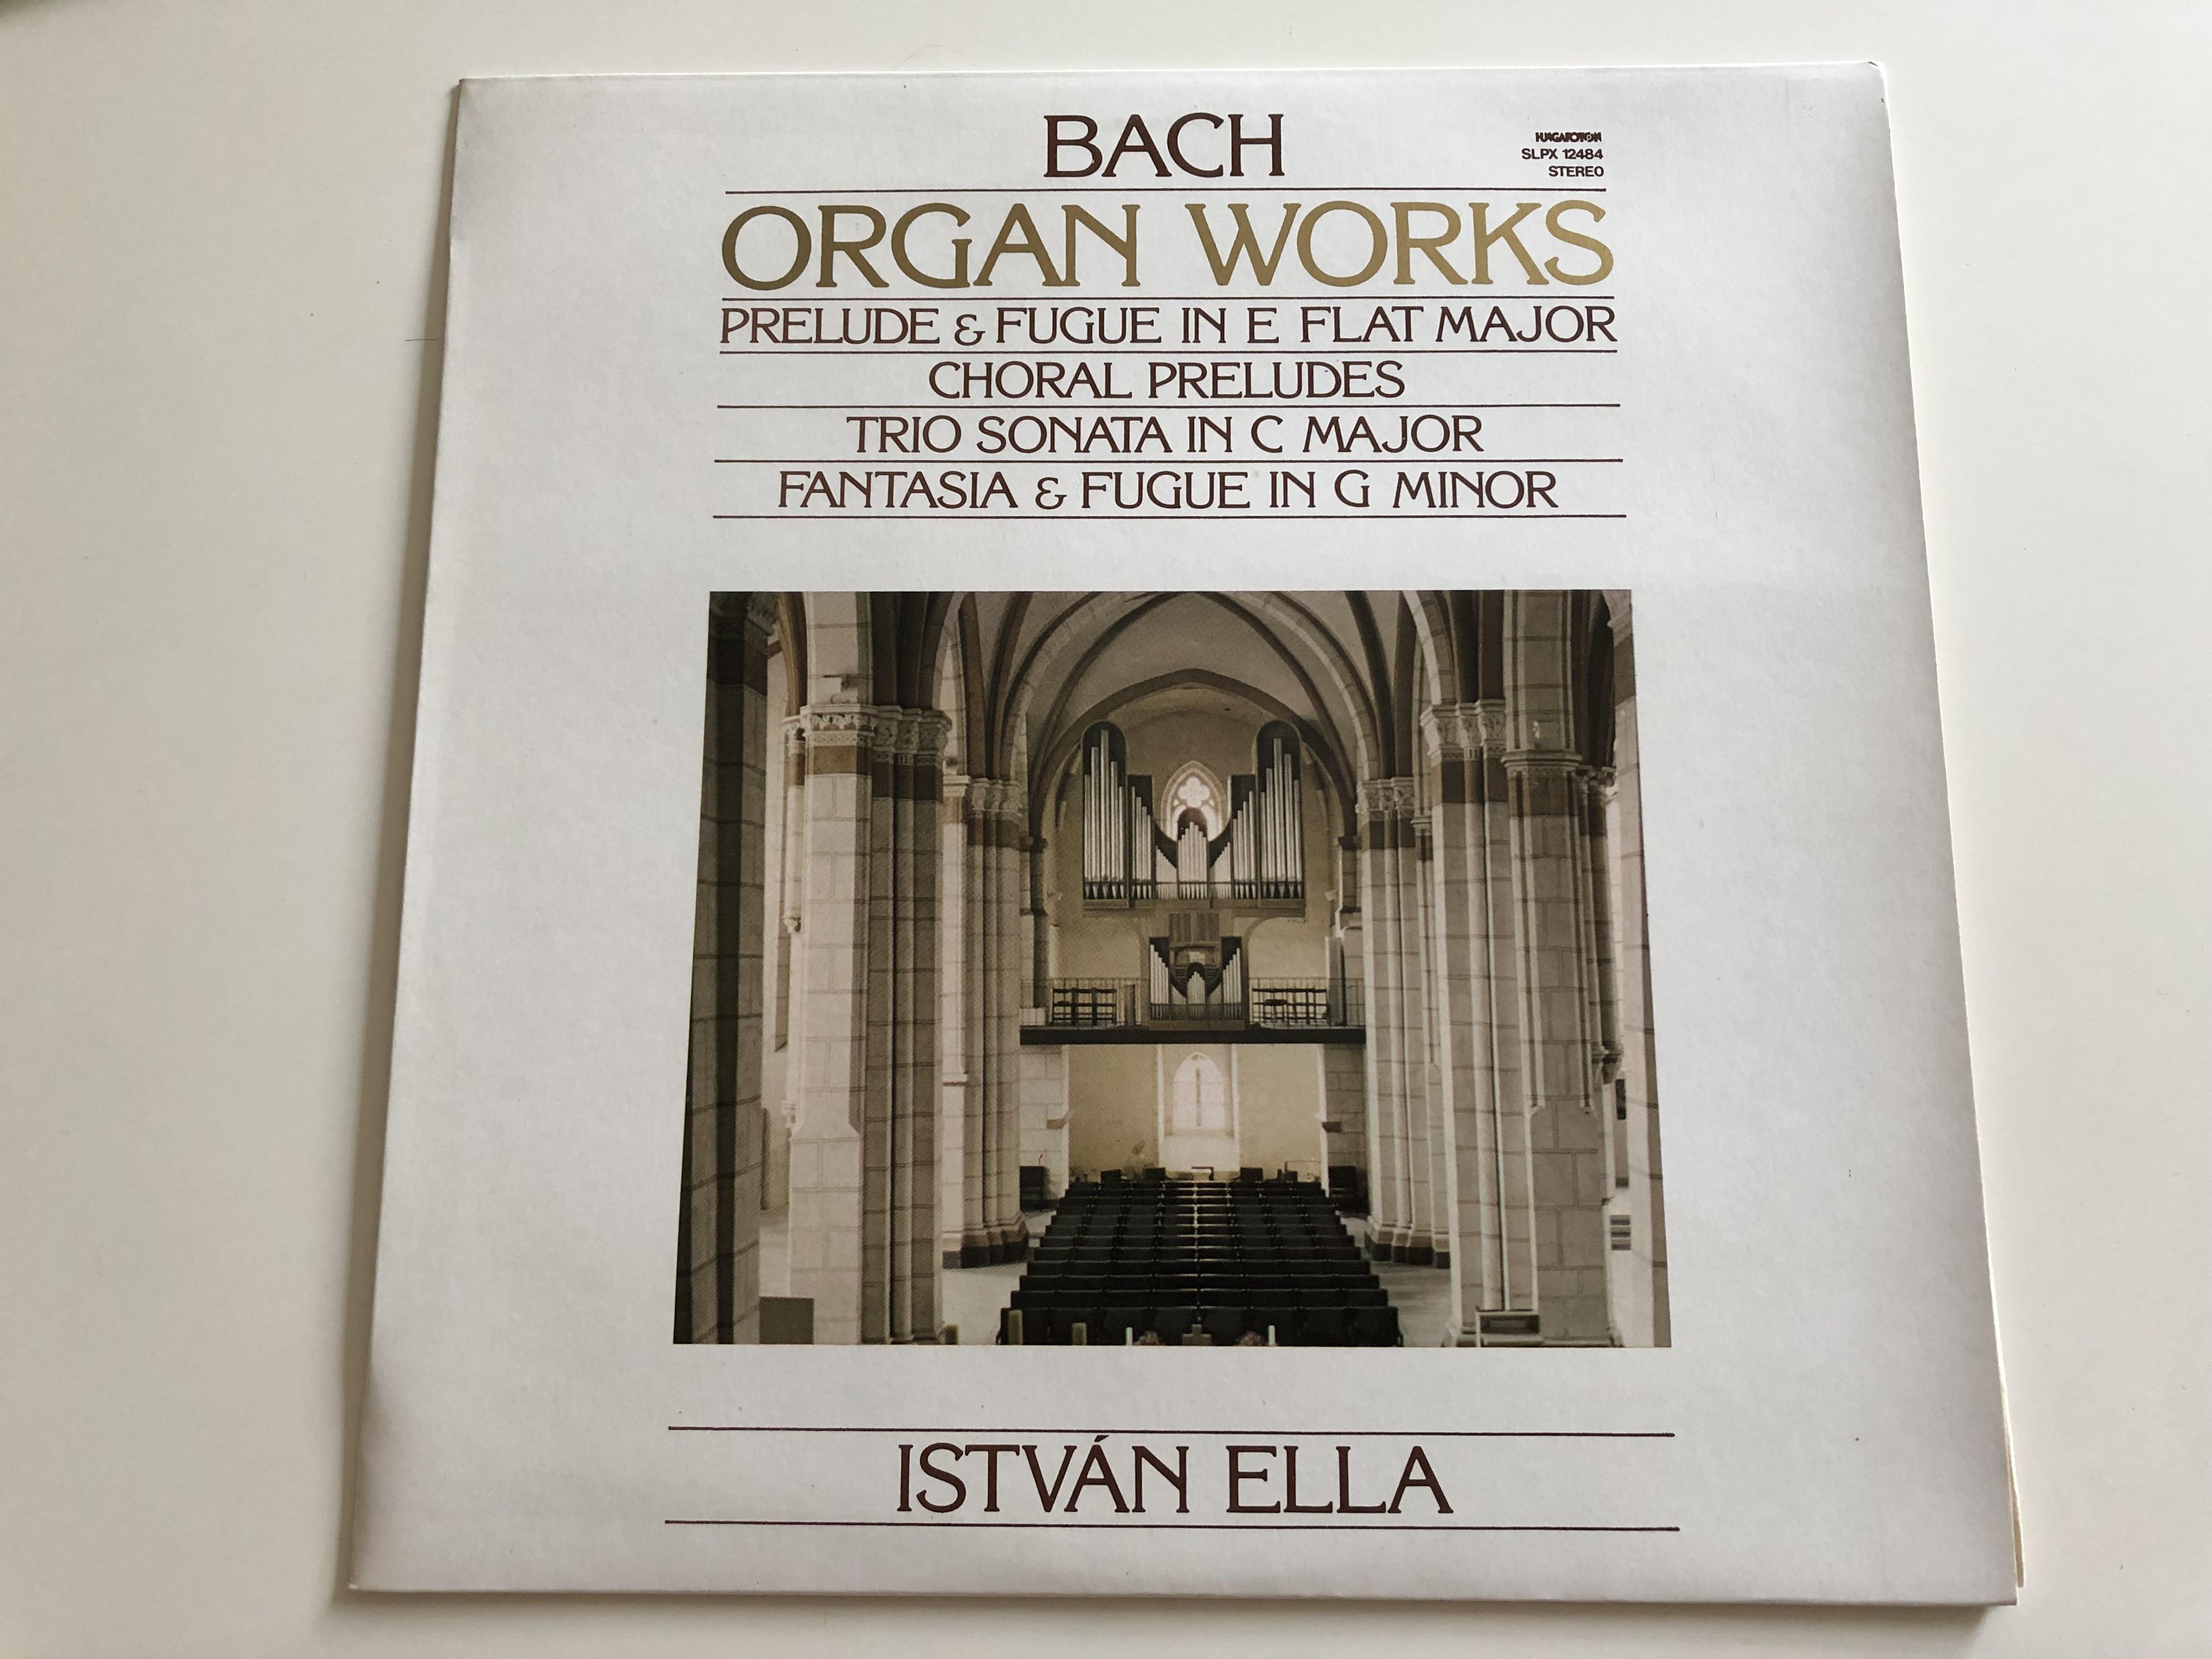 bach-organ-works-prelude-and-fugue-in-e-flat-major-choral-preludes-trio-sonata-in-c-major-fantasia-and-fugue-in-g-minor-istv-n-ella-hungaroton-lp-stereo-slpx-12484-1-.jpg